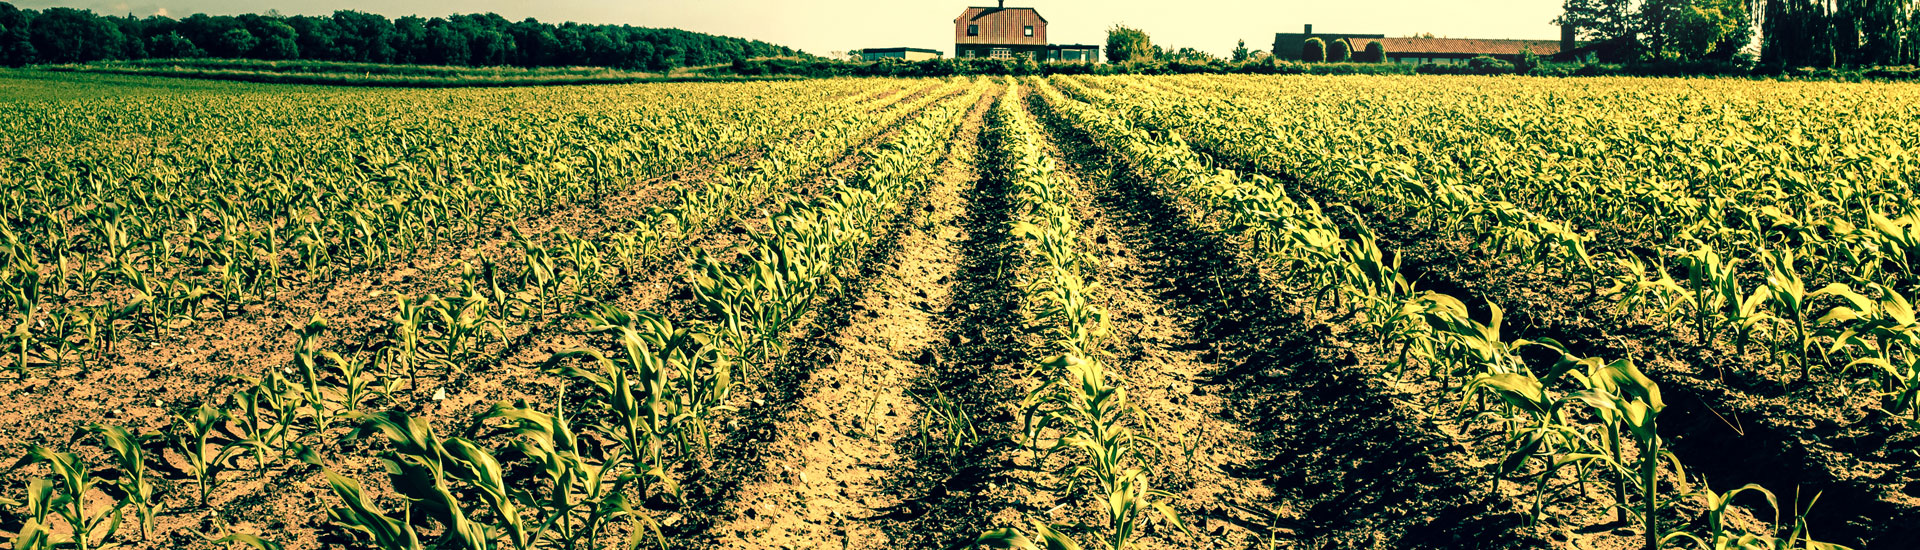 farm-image-1